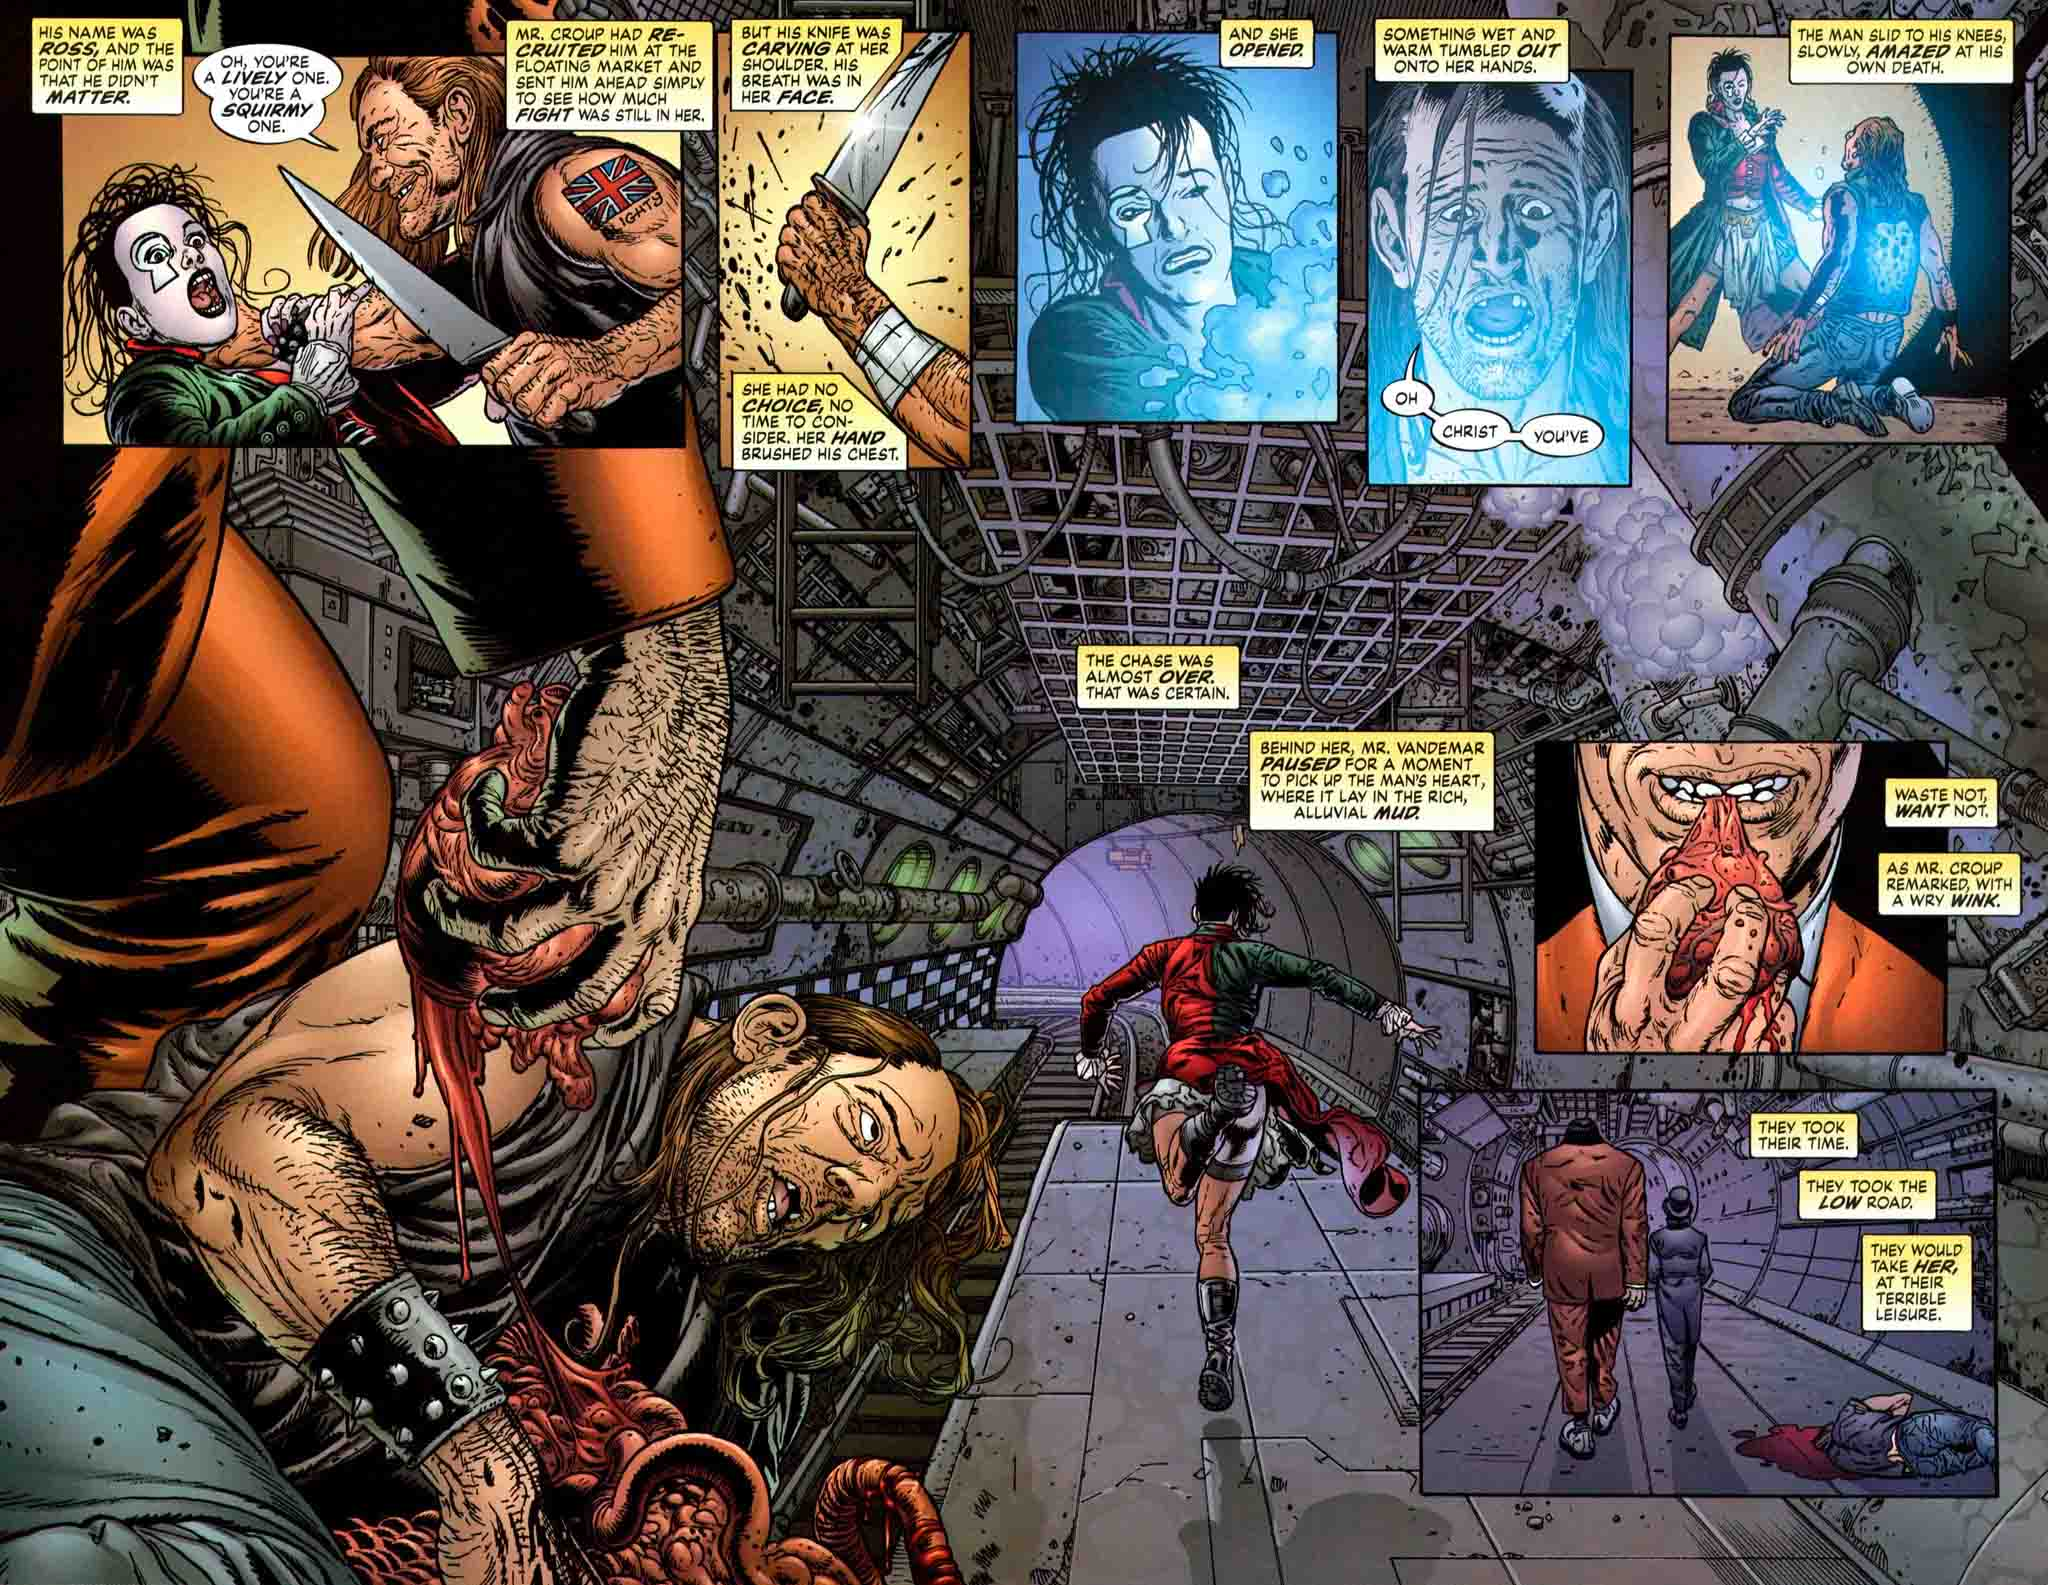 Golem-Comics-resena-neverwhere-de-neil-gaiman-04